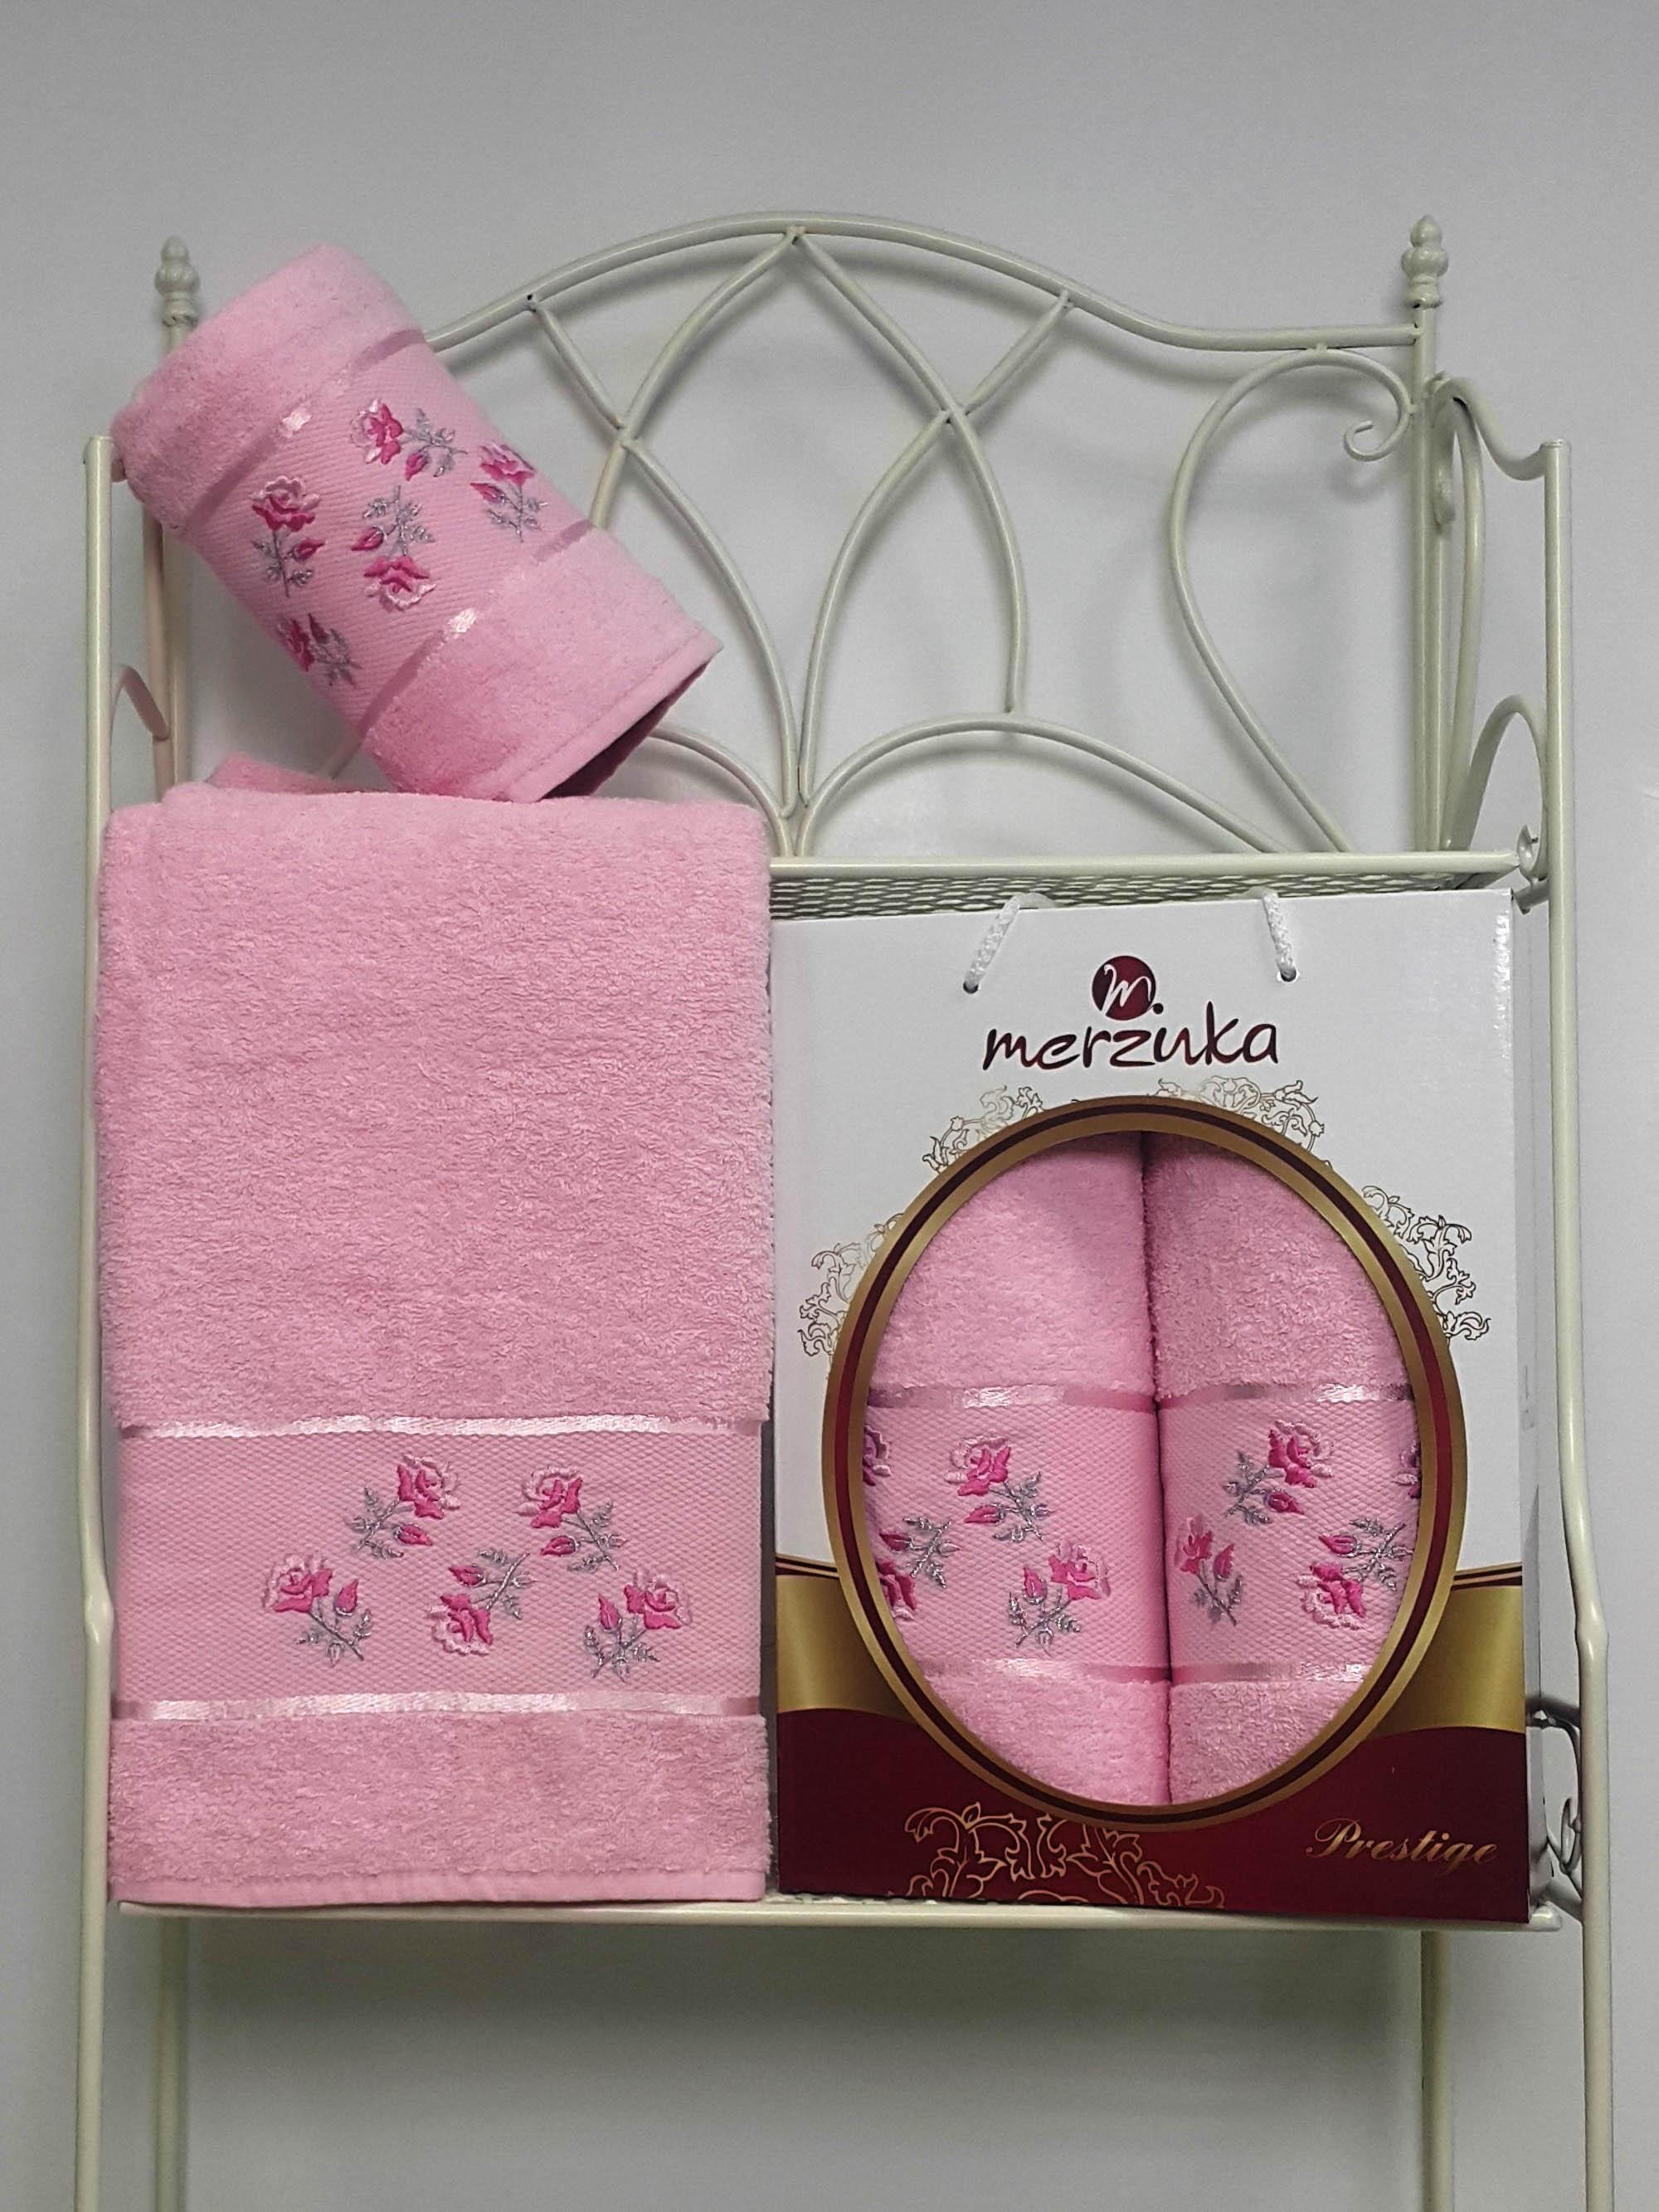 Полотенца Oran Merzuka Набор из 2 полотенец Prestij Цвет: Светло-Розовый набор из 2 полотенец merzuka sakura 50х90 70х140 8430 кремовый